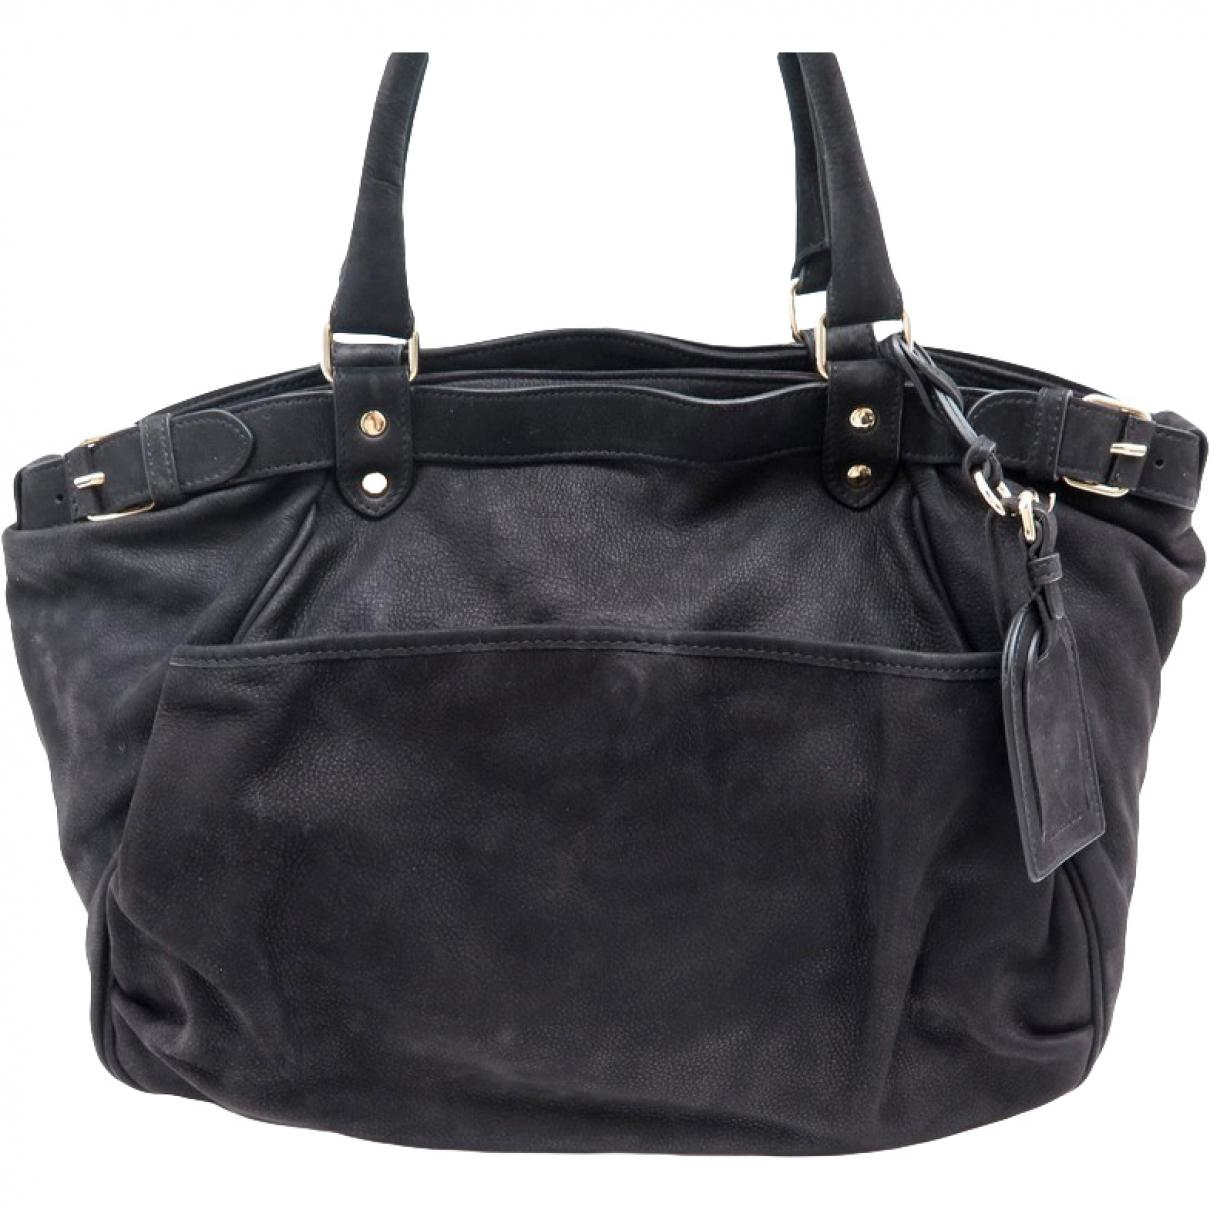 82c87afb3fa9 Vanessa Bruno Lune Leather Handbag in Black - Lyst